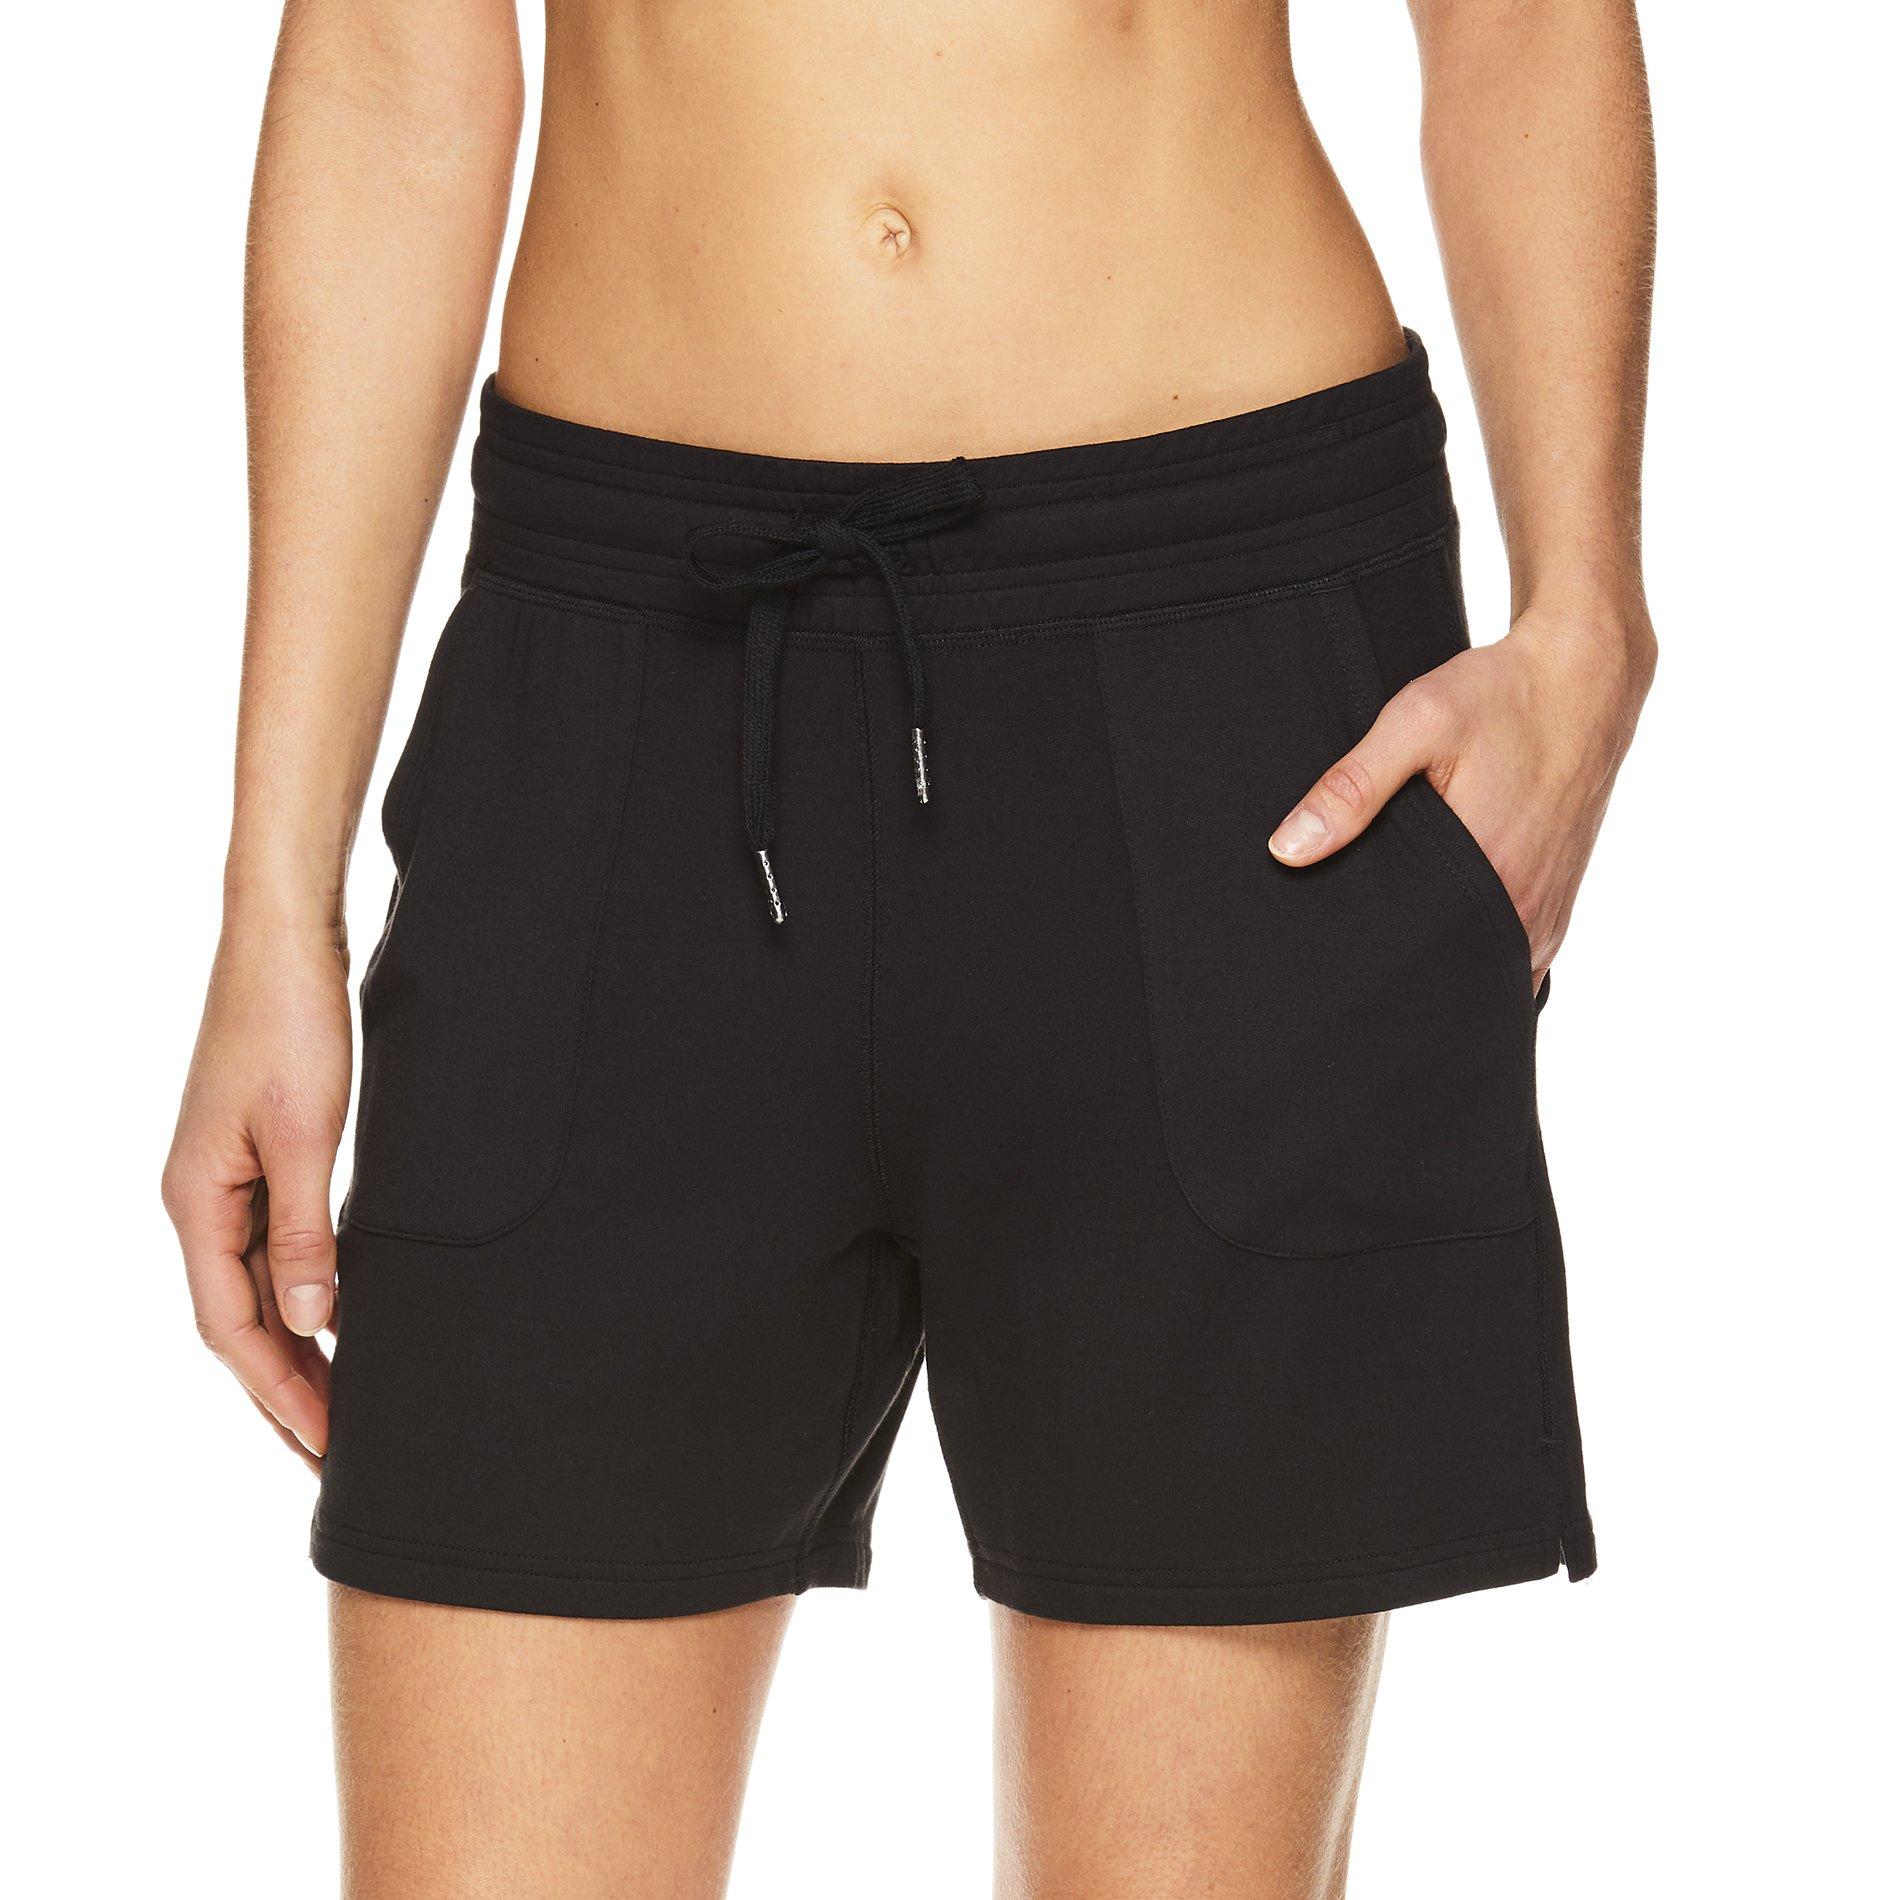 Gaiam Women's Warrior Yoga Short - Bike & Running Activewear Shorts w/Pockets - Black (Tap Shoe), X-Small by Gaiam